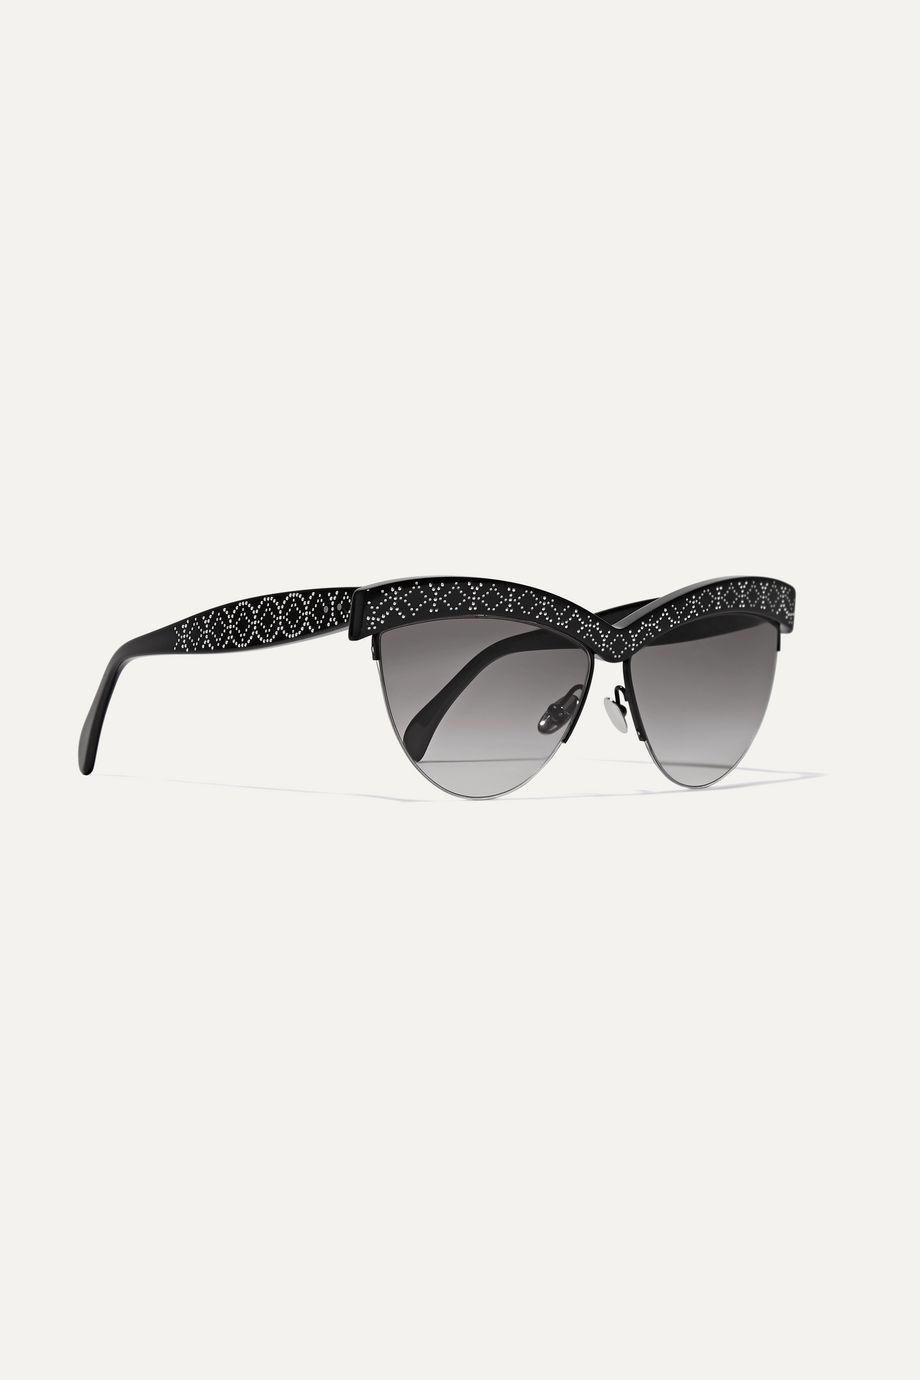 Alaïa D-Frame studded acetate sunglasses